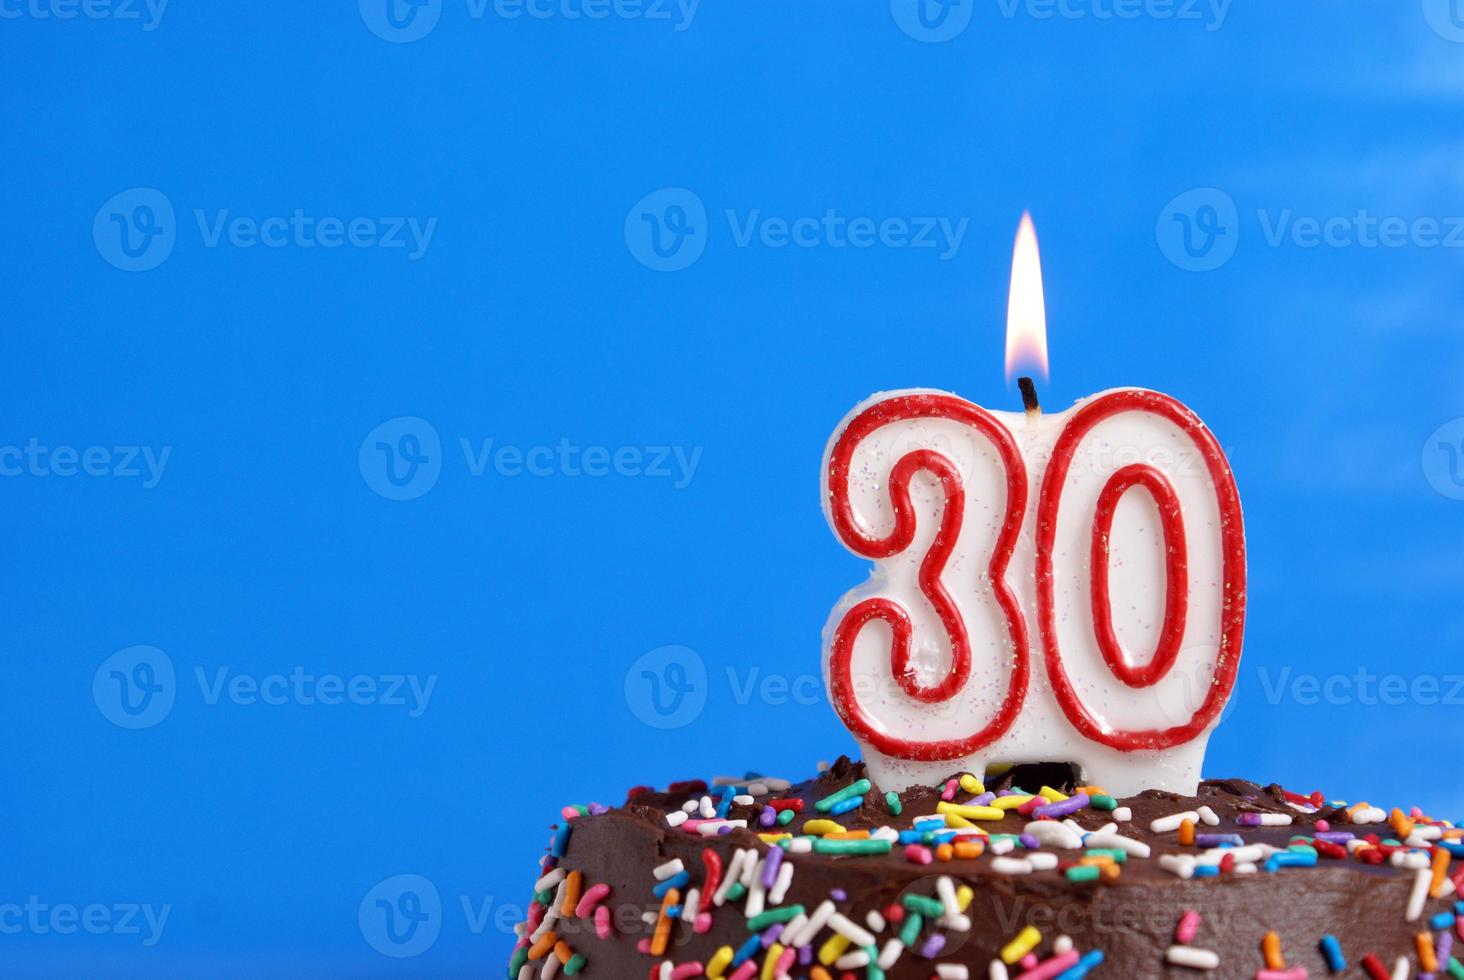 Celebrating Thirty Years photo